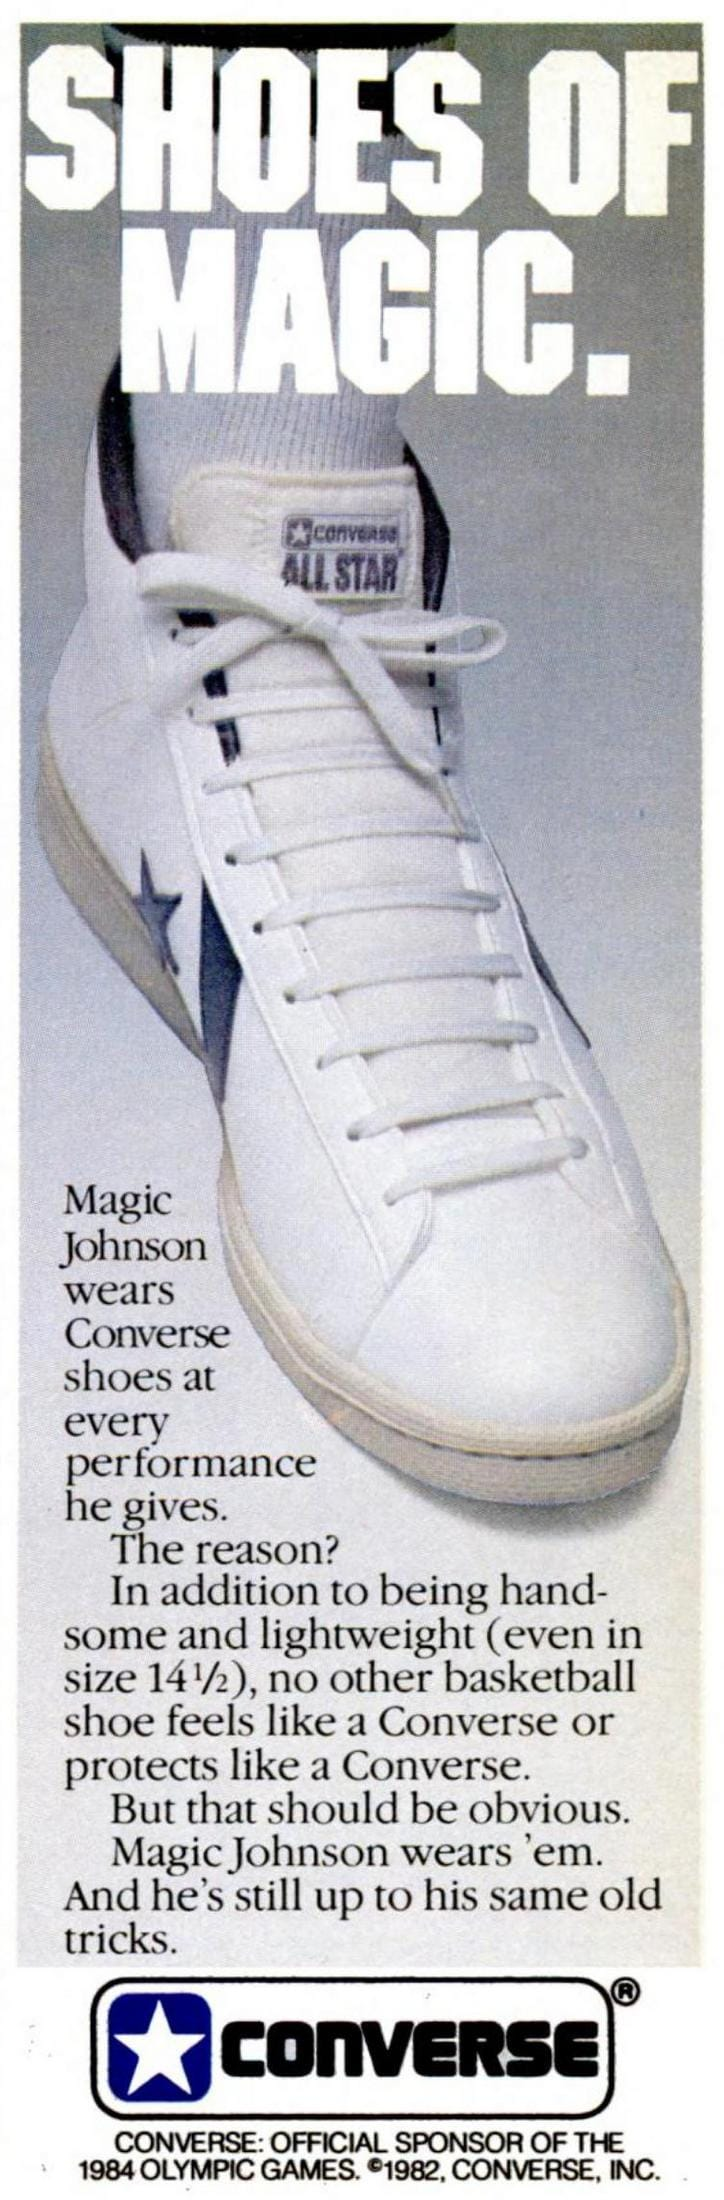 Retro 80s Converse shoes of magic - 1984